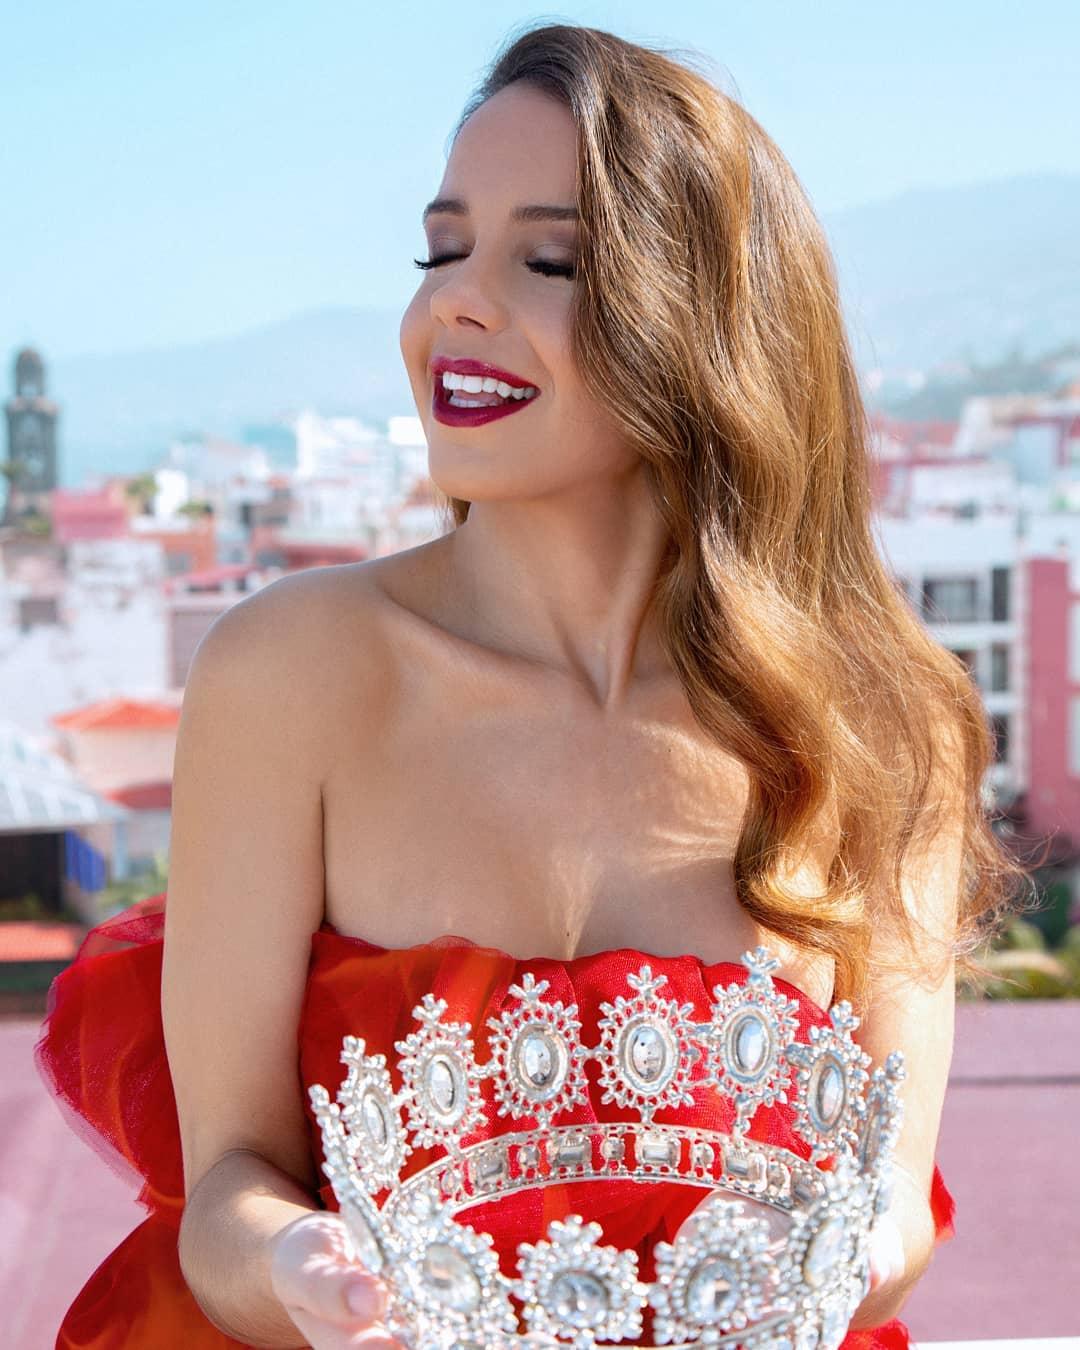 marta lorenzo, miss earth spain 2020/1st runner-up de world beauty queen 2018/miss eco espana 2017. - Página 5 Martal23